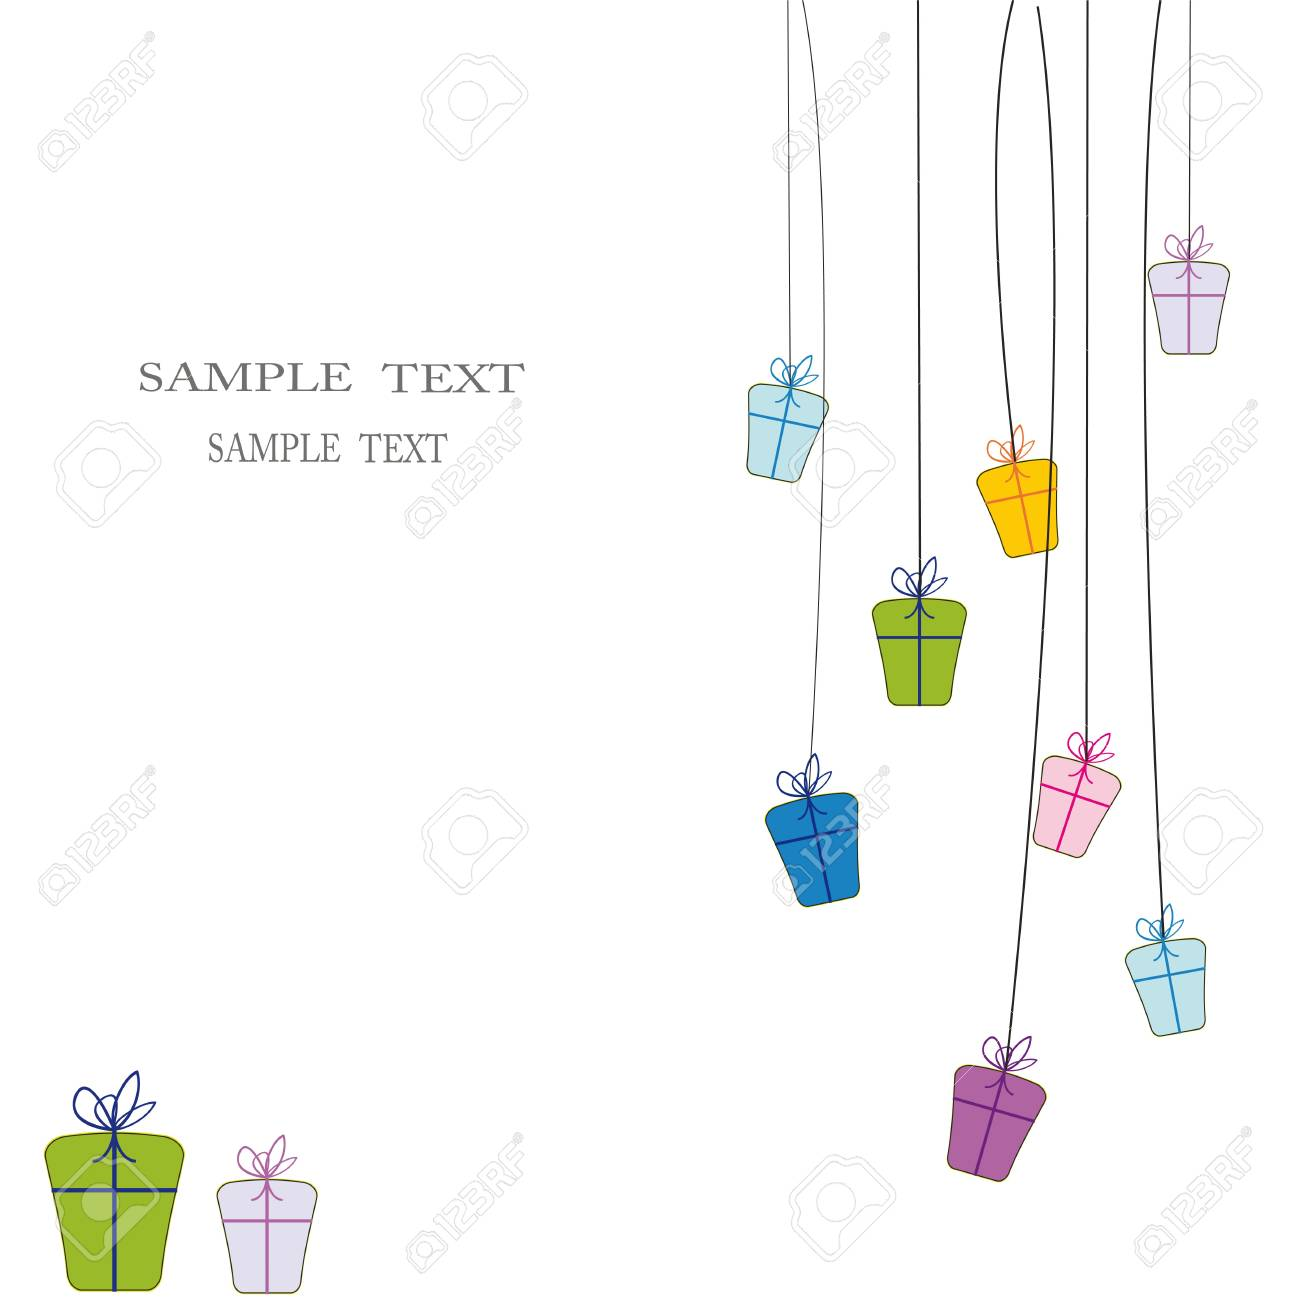 Cute card on festivite occassion Stock Vector - 9376959